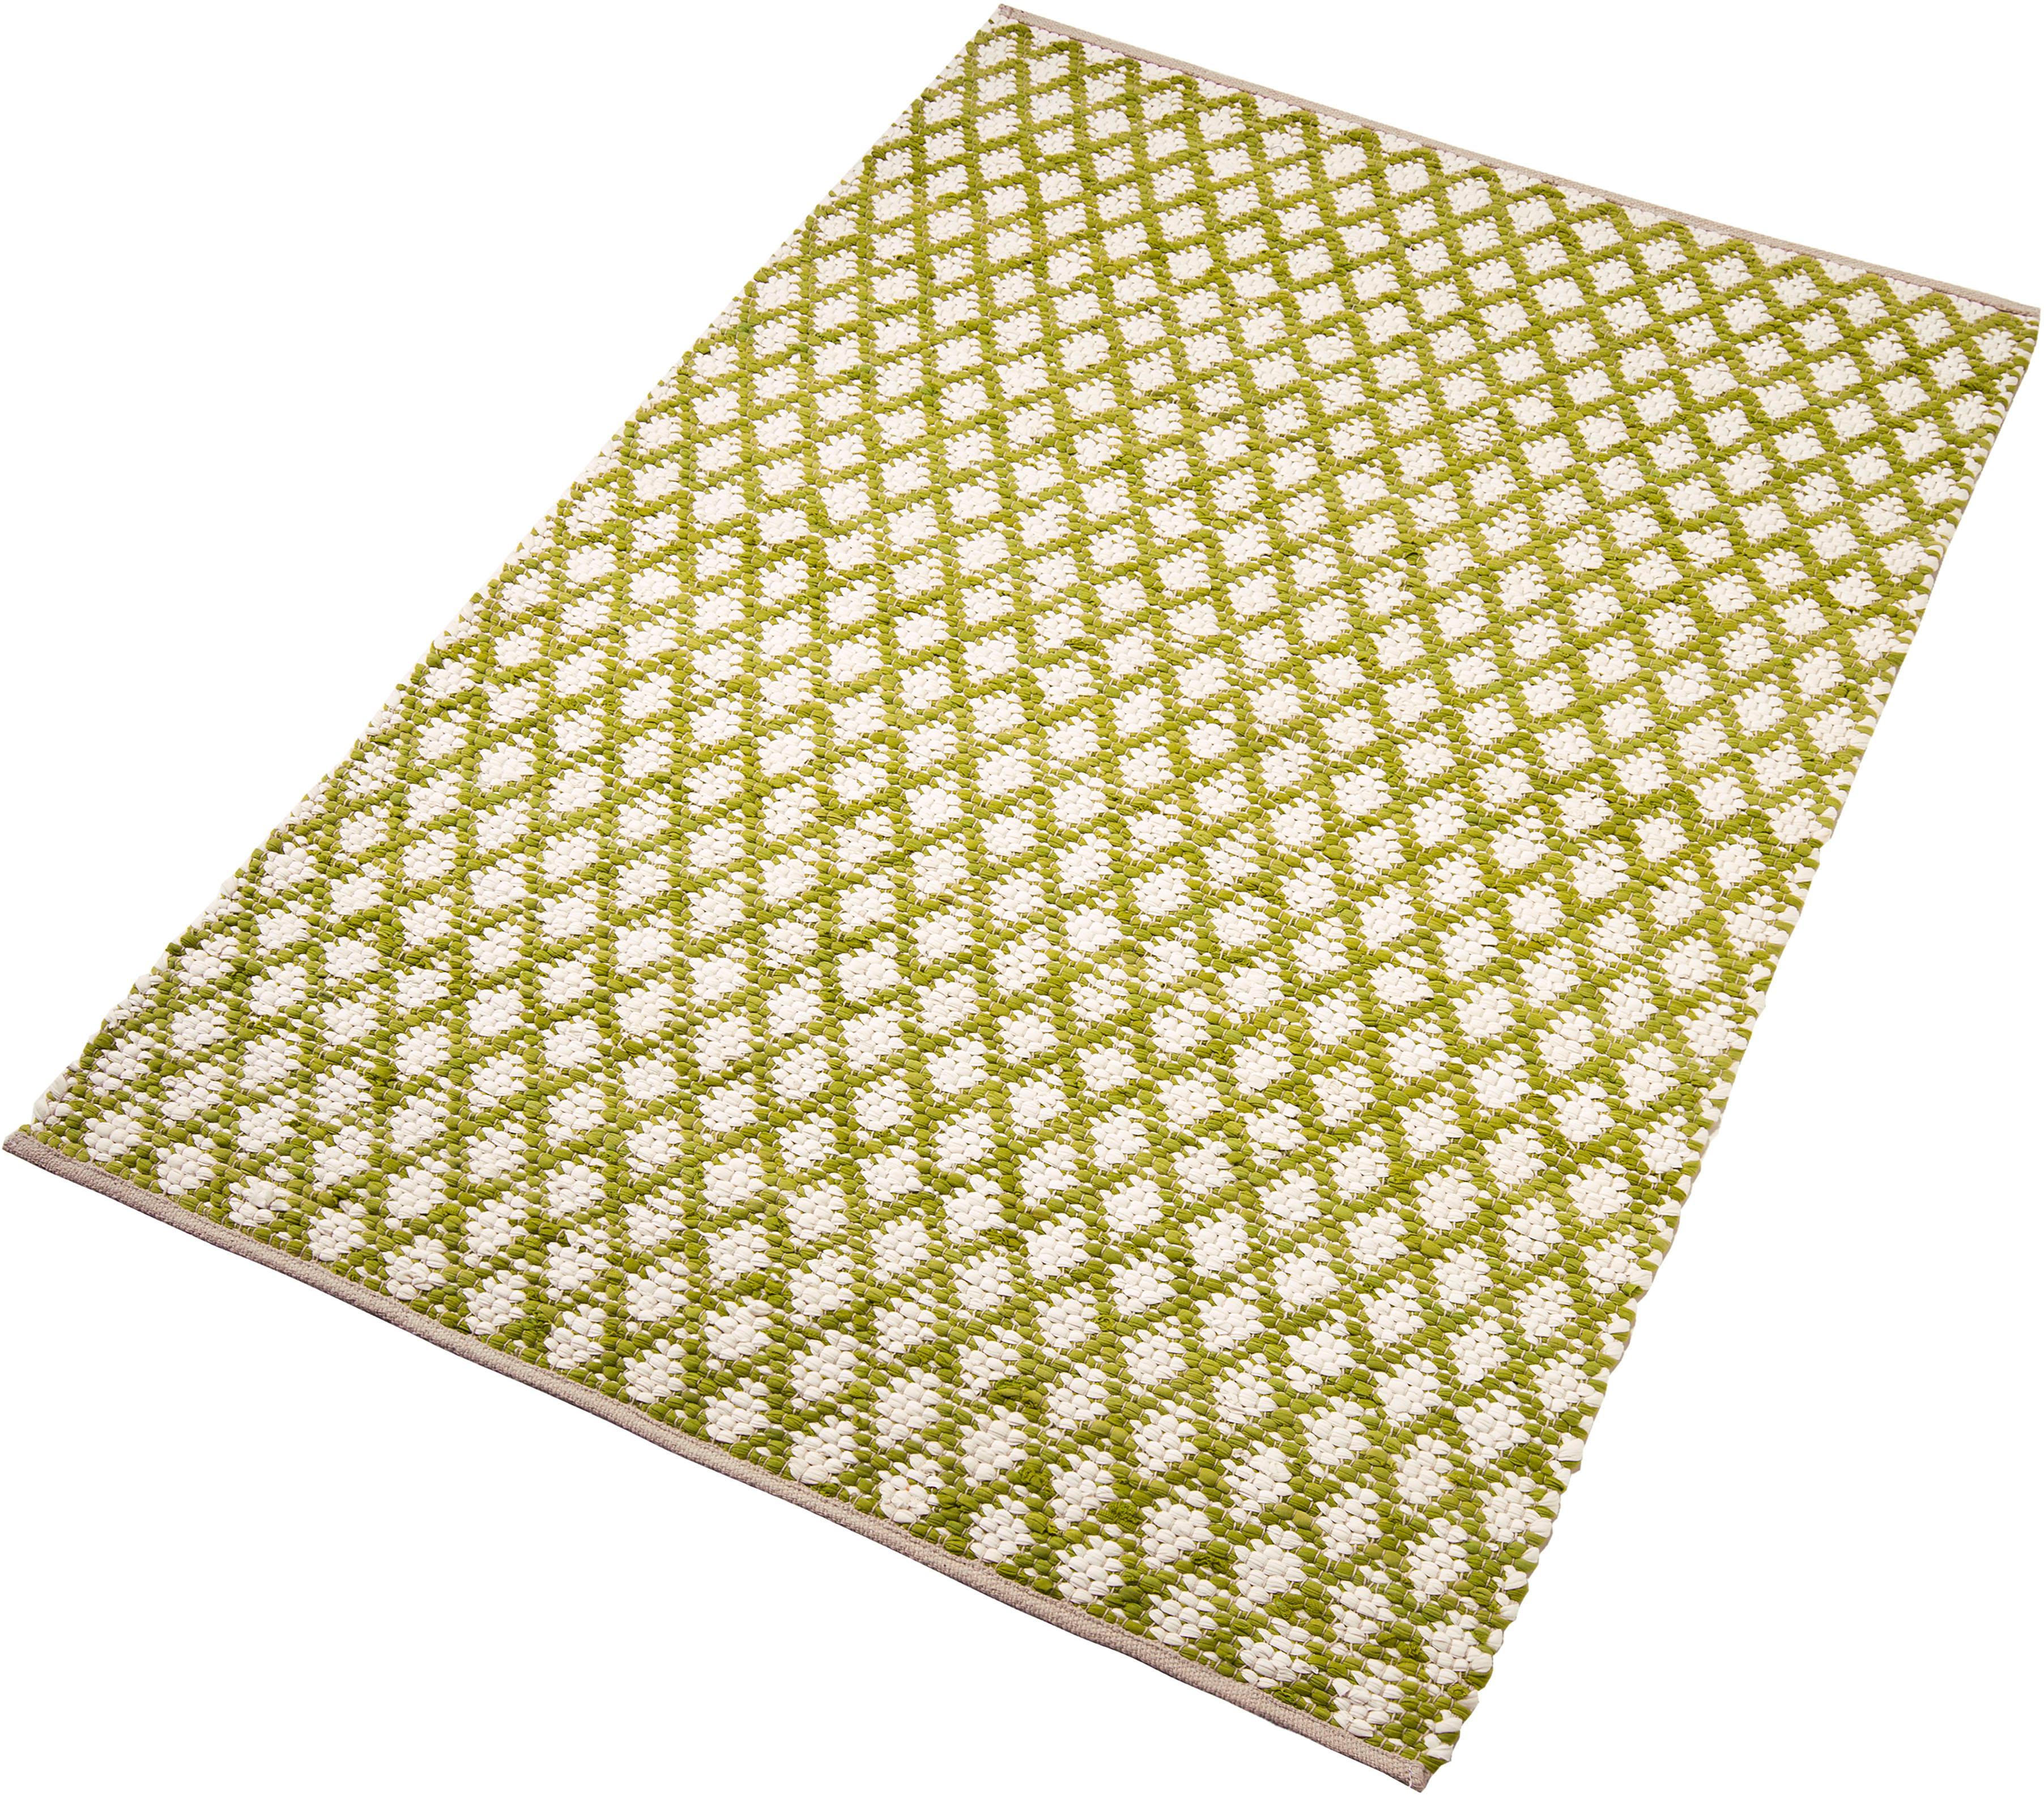 Teppich Edge Home affaire Collection rechteckig Höhe 10 mm handgewebt